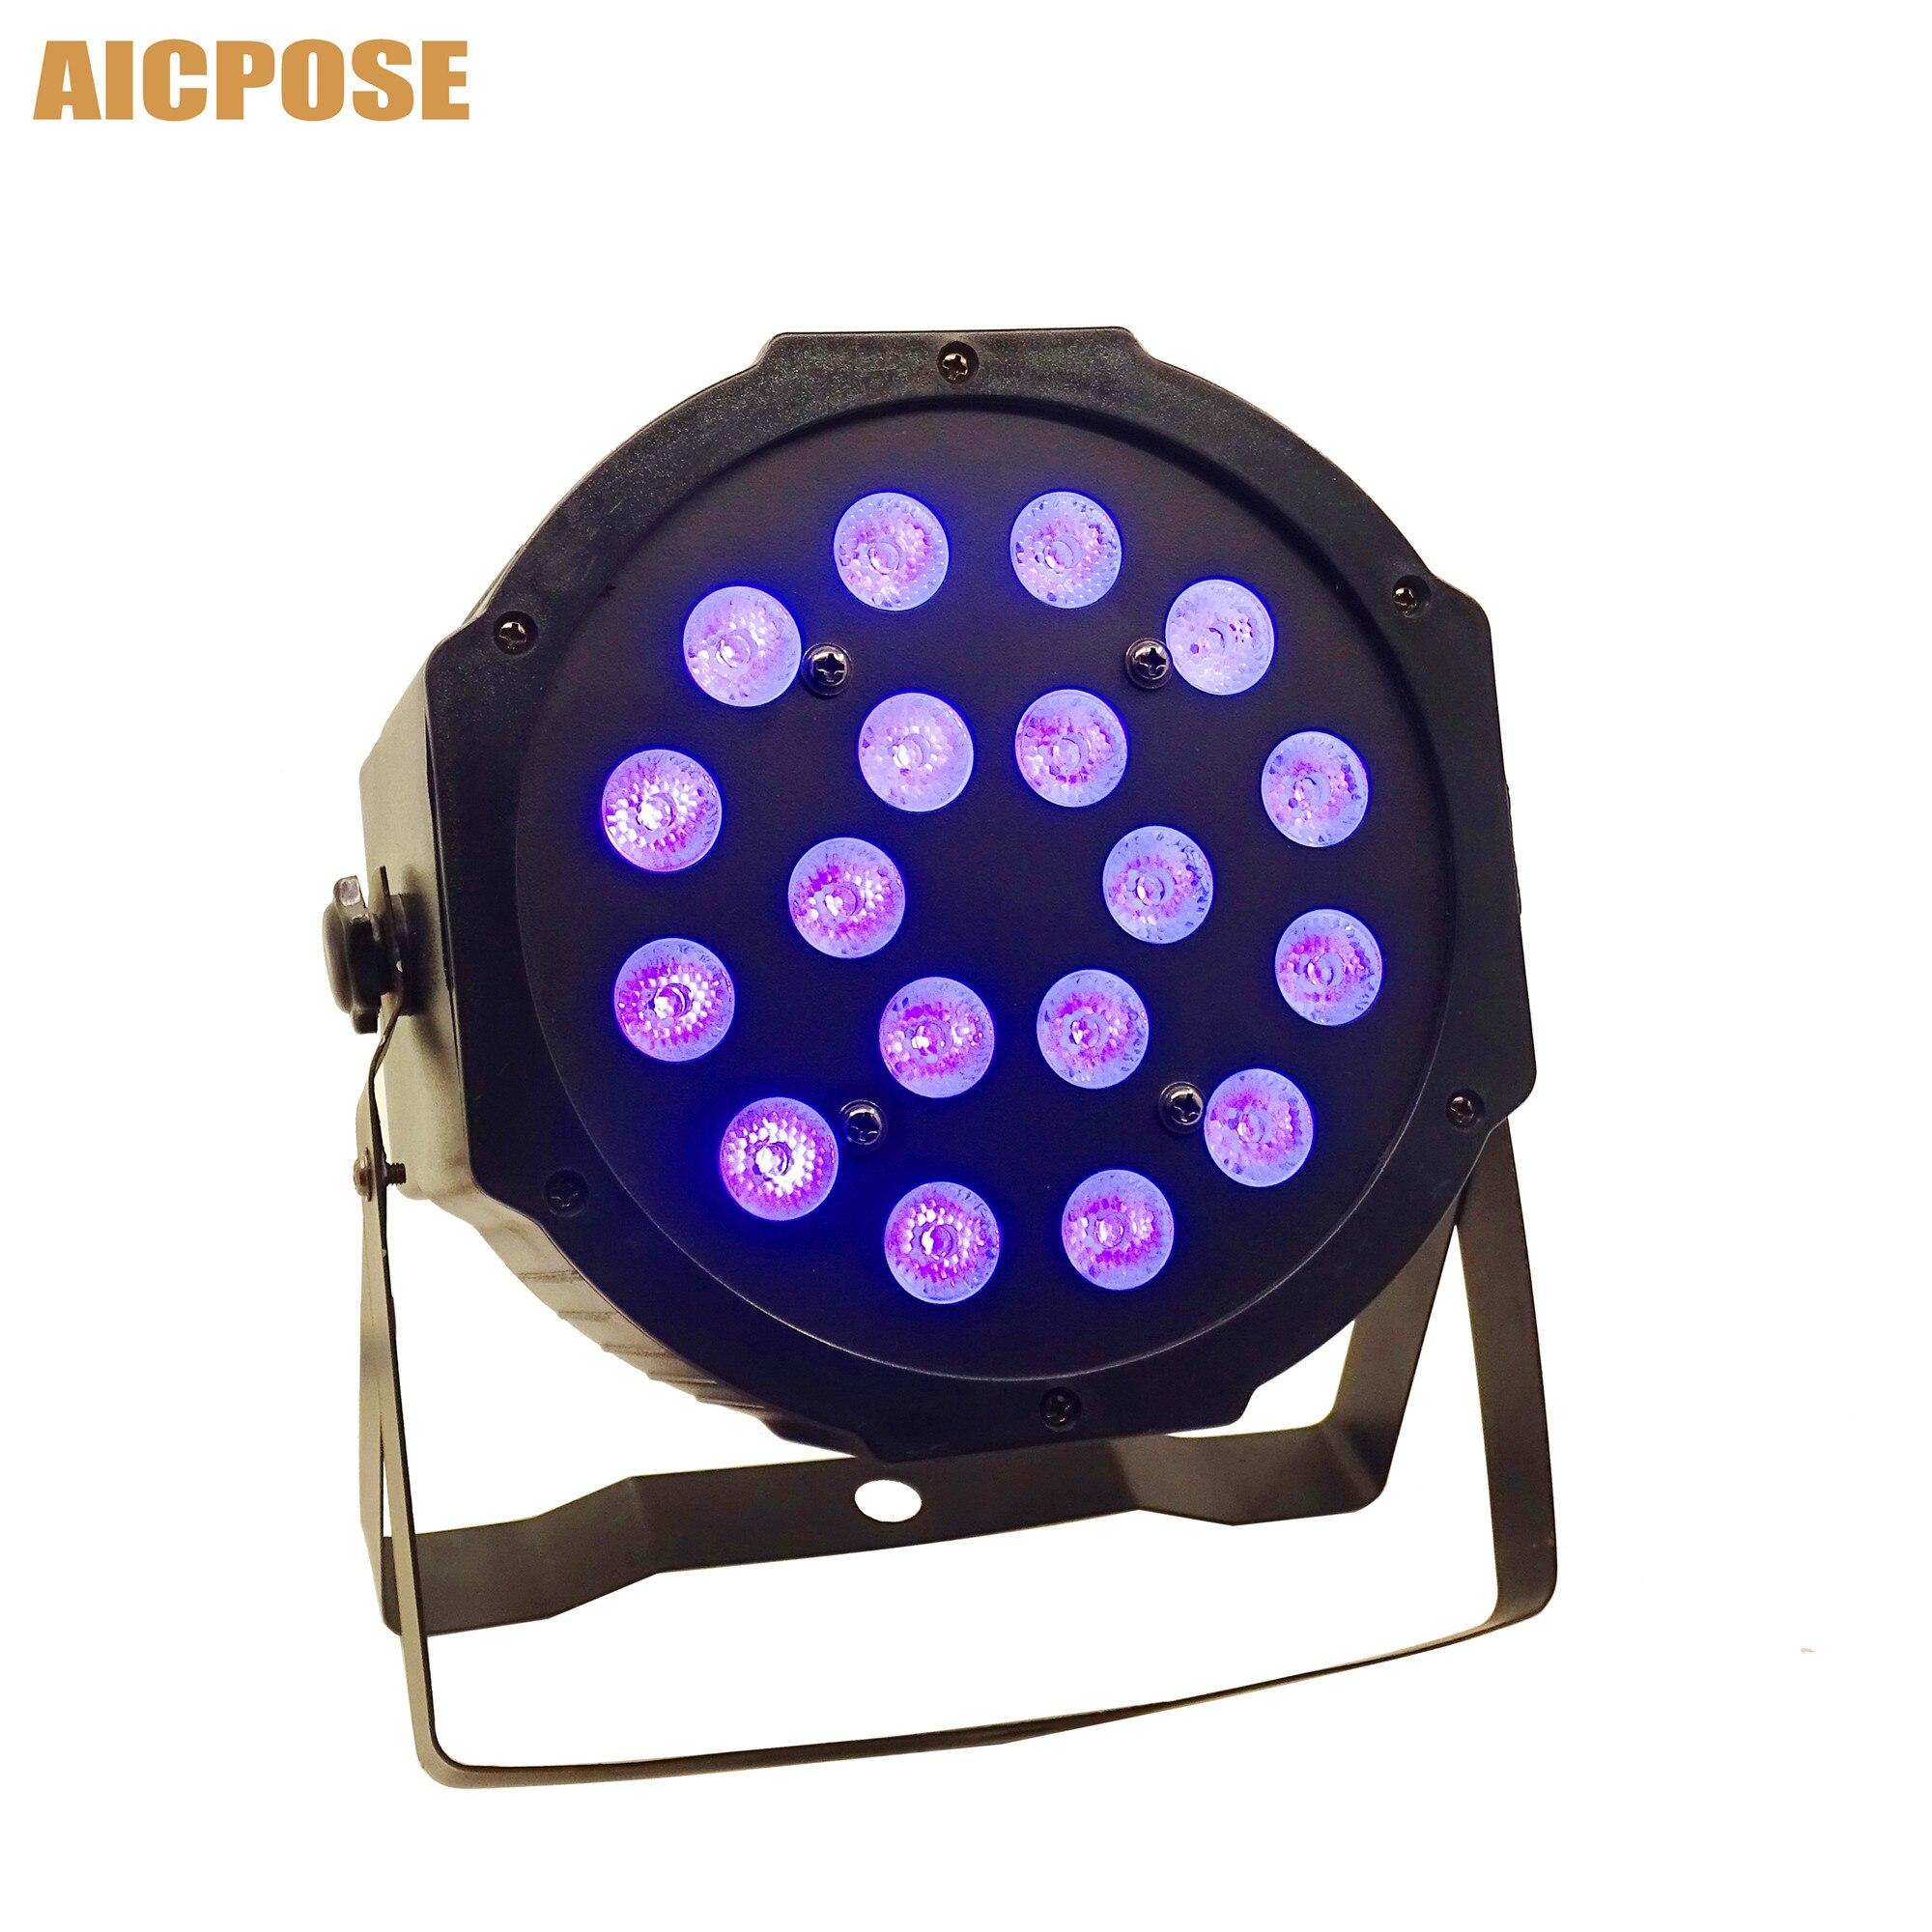 18pcs 3w Led Lamp Beads 18x3w UV LED Par Stage Light Flat Par Led Dmx512 Disco Lights Professional Stage Dj Equipment